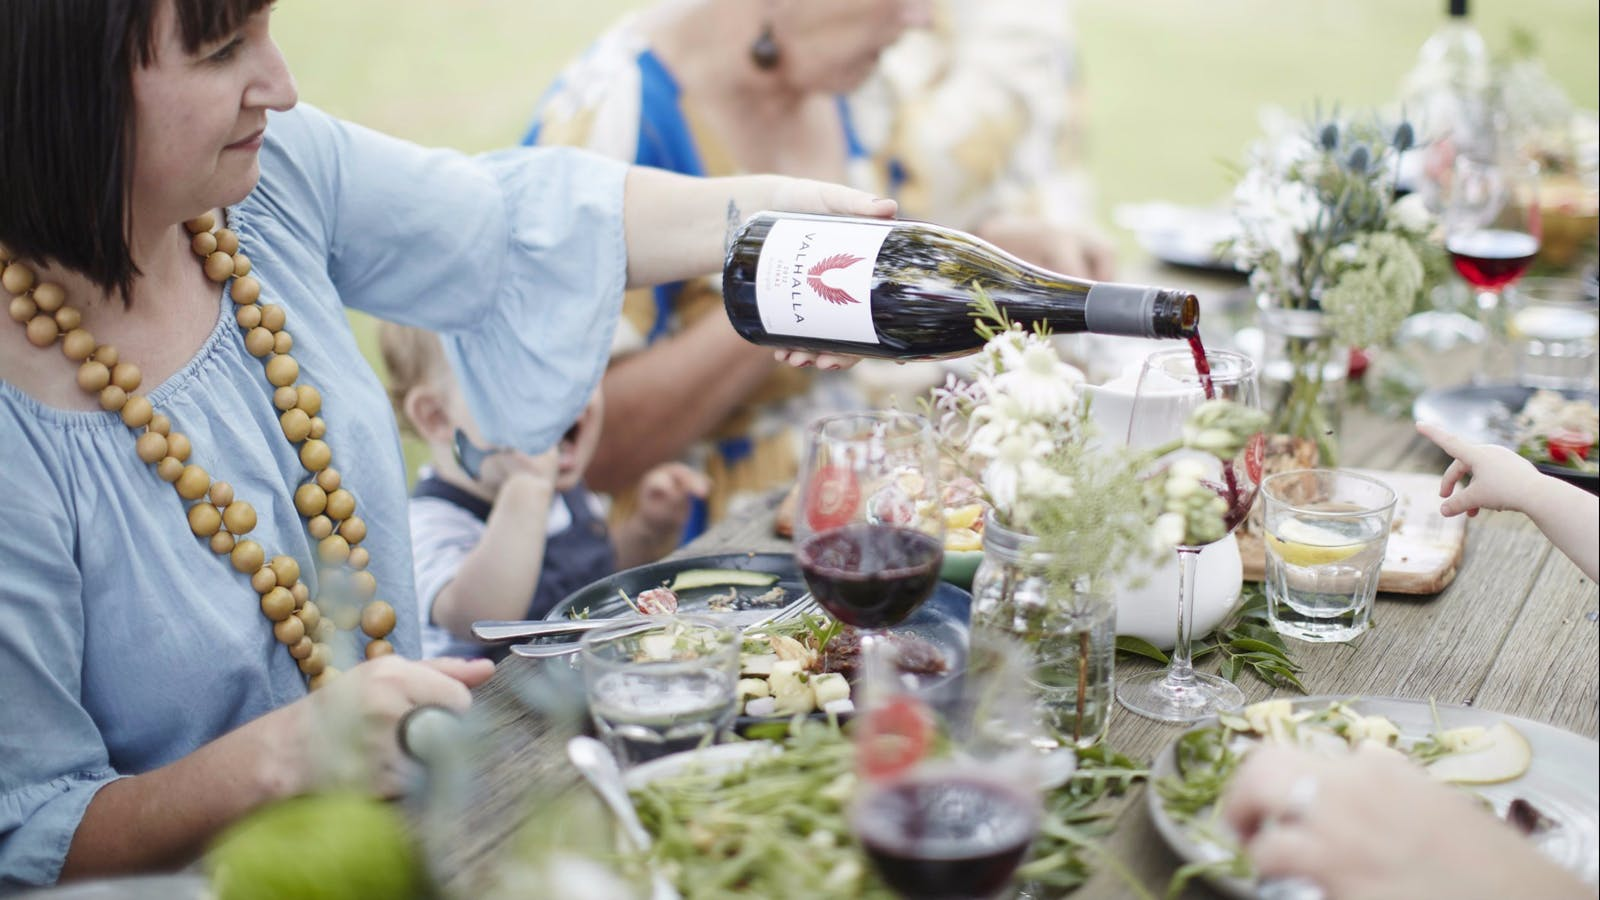 Lady poring Valhalla Wine